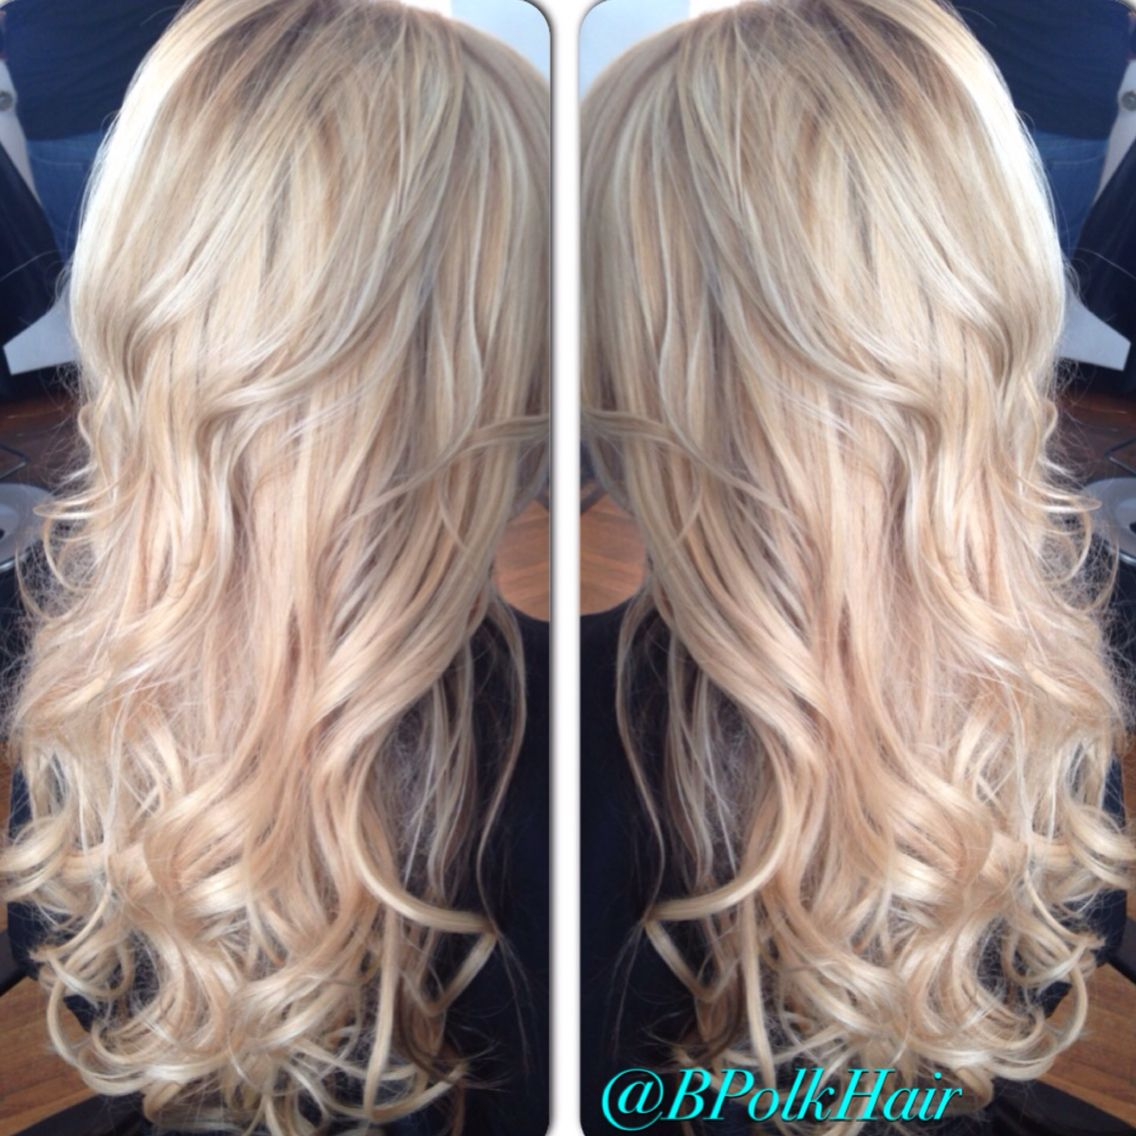 @bpolkhair - Charlotte NC #blonde #curls